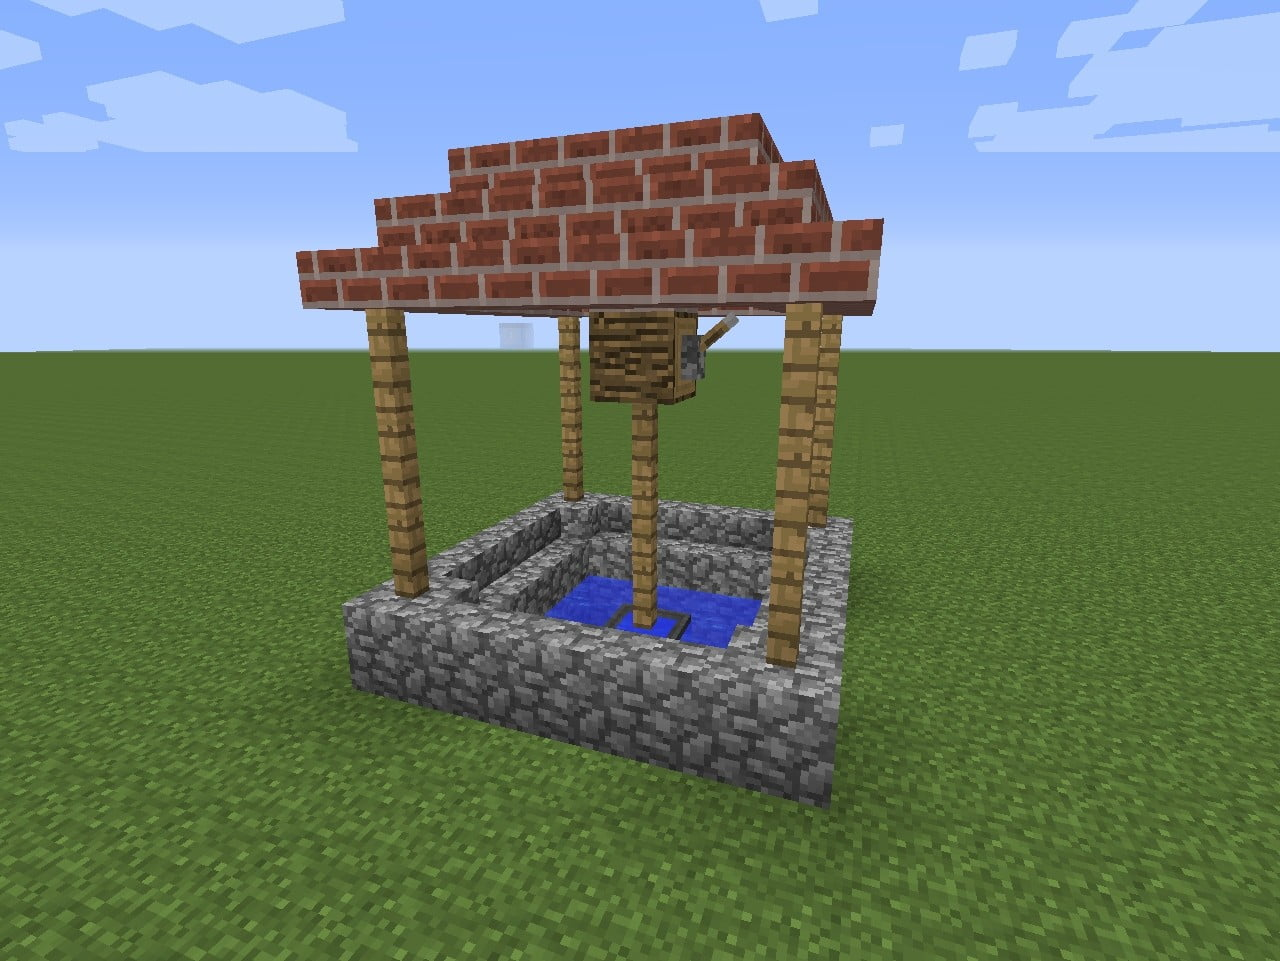 ᐅ Ziehbrunnen In Minecraft Bauen Minecraft Bauideen De